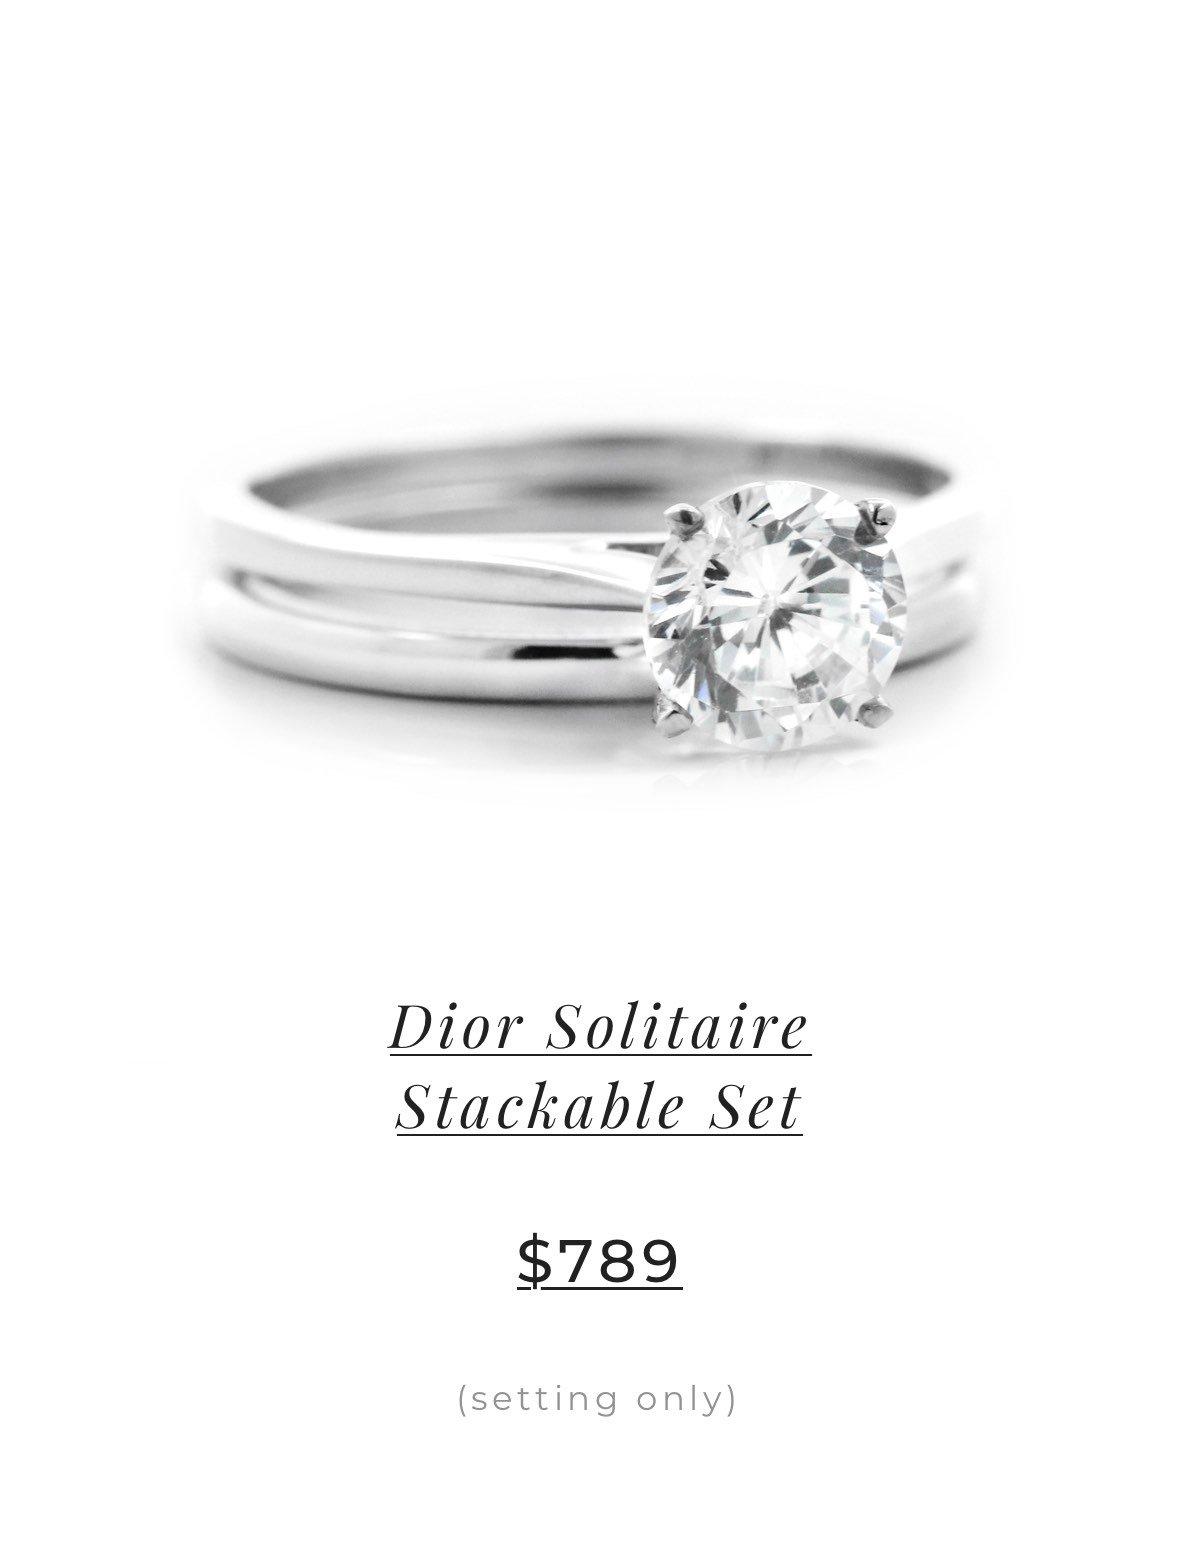 Dior Solitaire Stackable Set